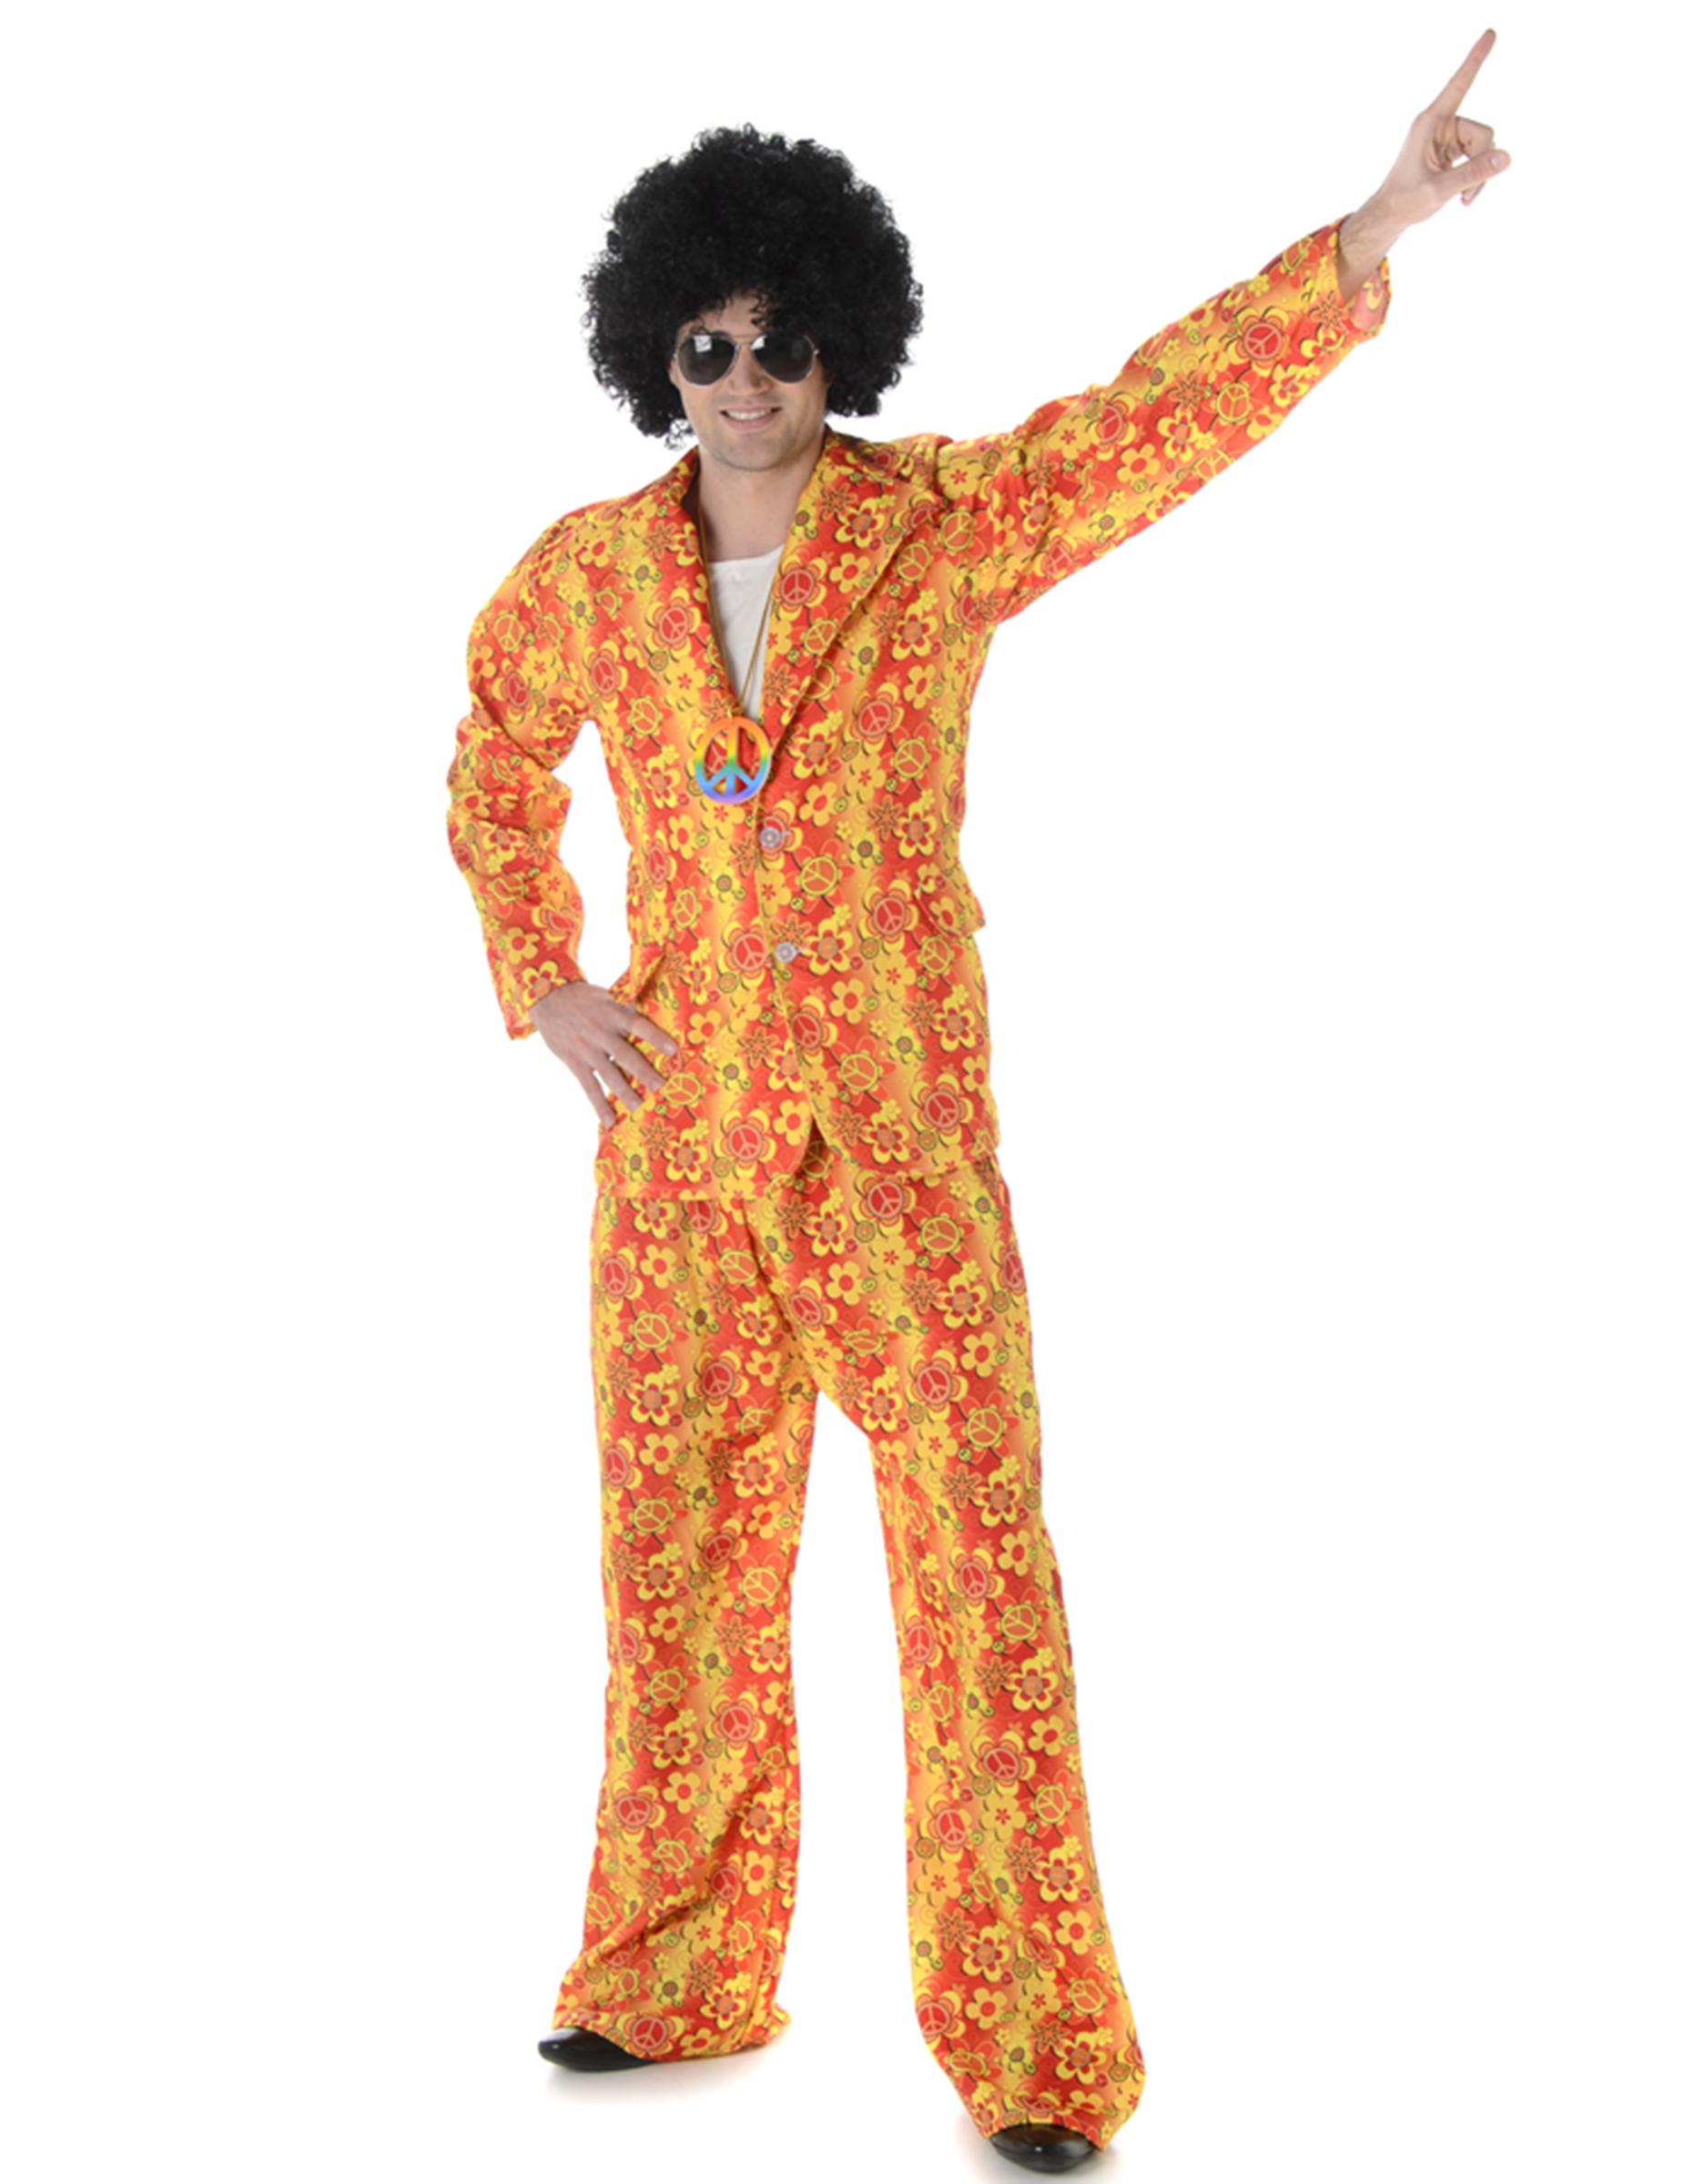 hippie anzug 70er jahre kost m gelb orange g nstige faschings kost me bei karneval megastore. Black Bedroom Furniture Sets. Home Design Ideas